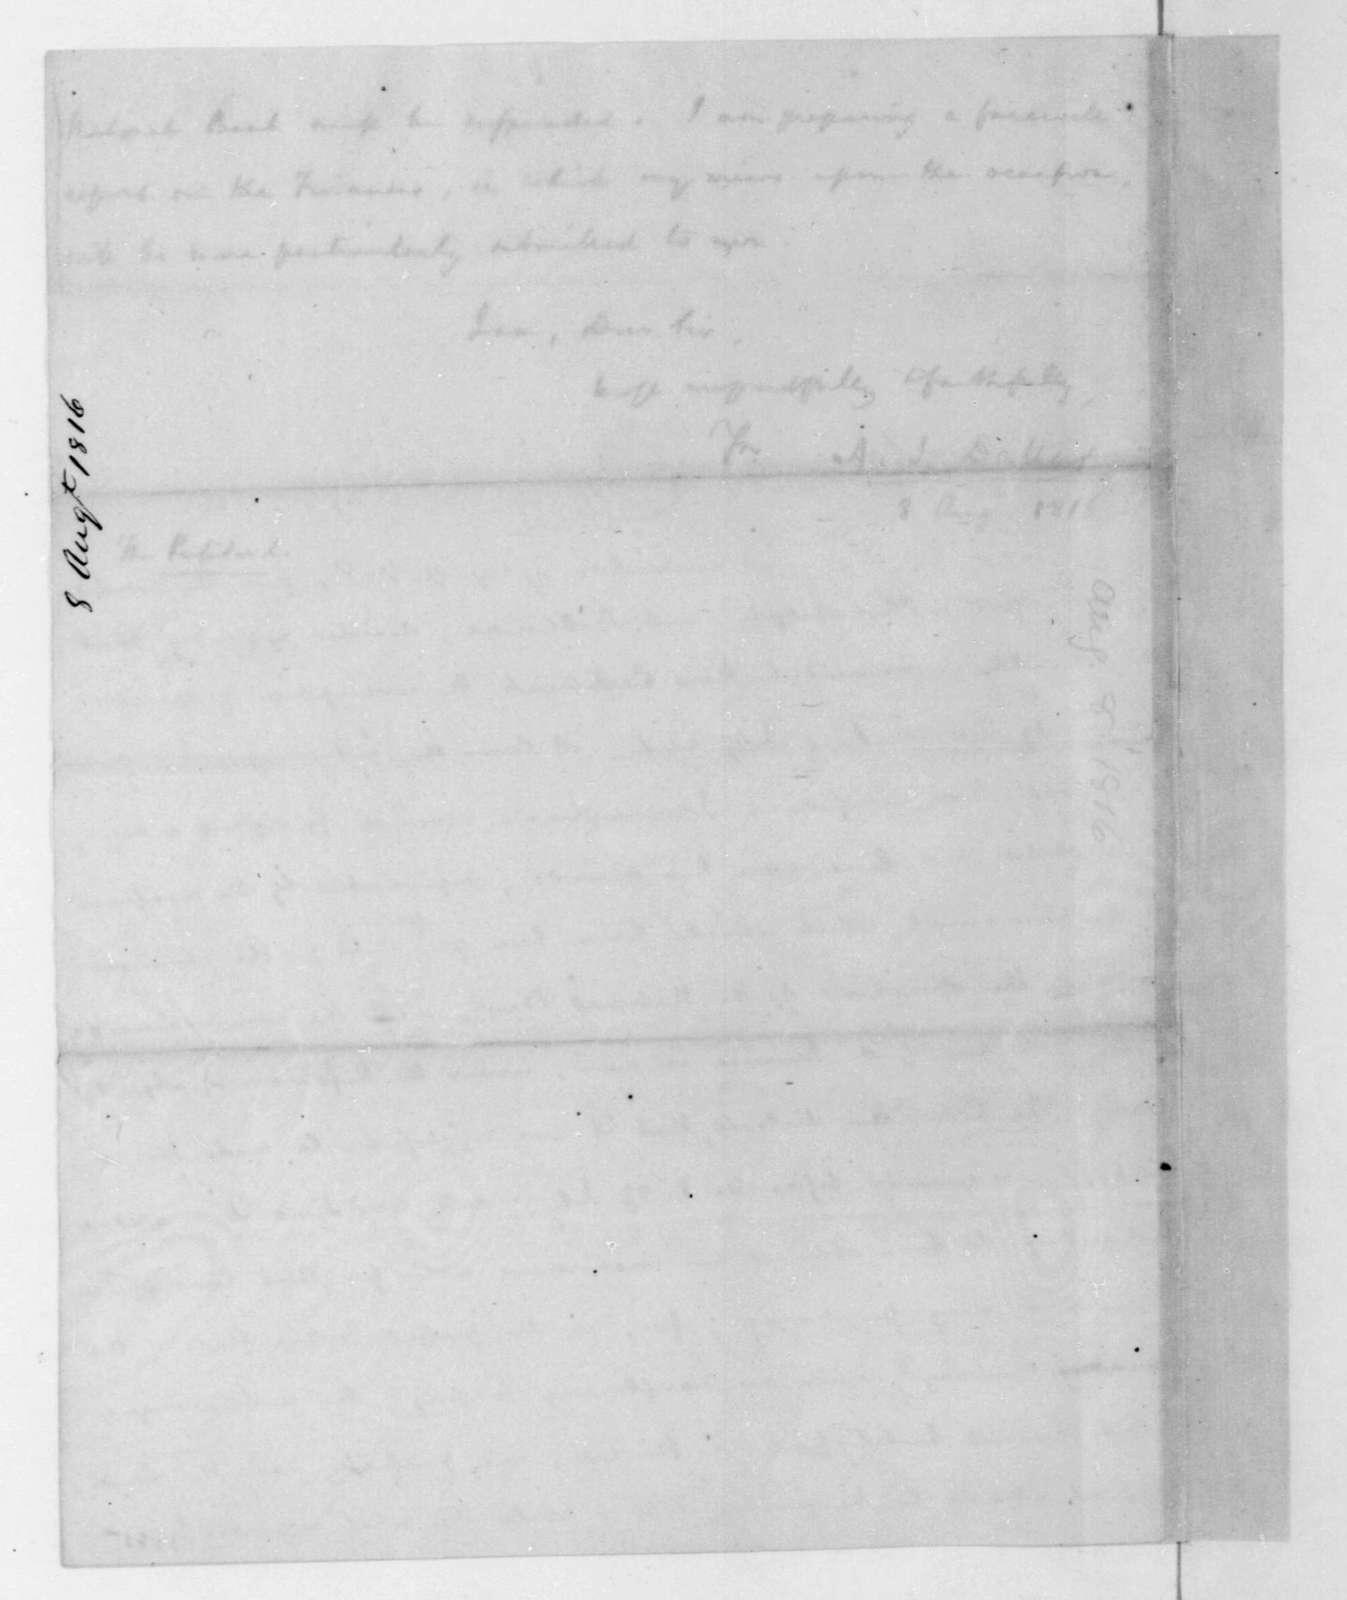 Alexander J. Dallas to James Madison, August 8, 1816.